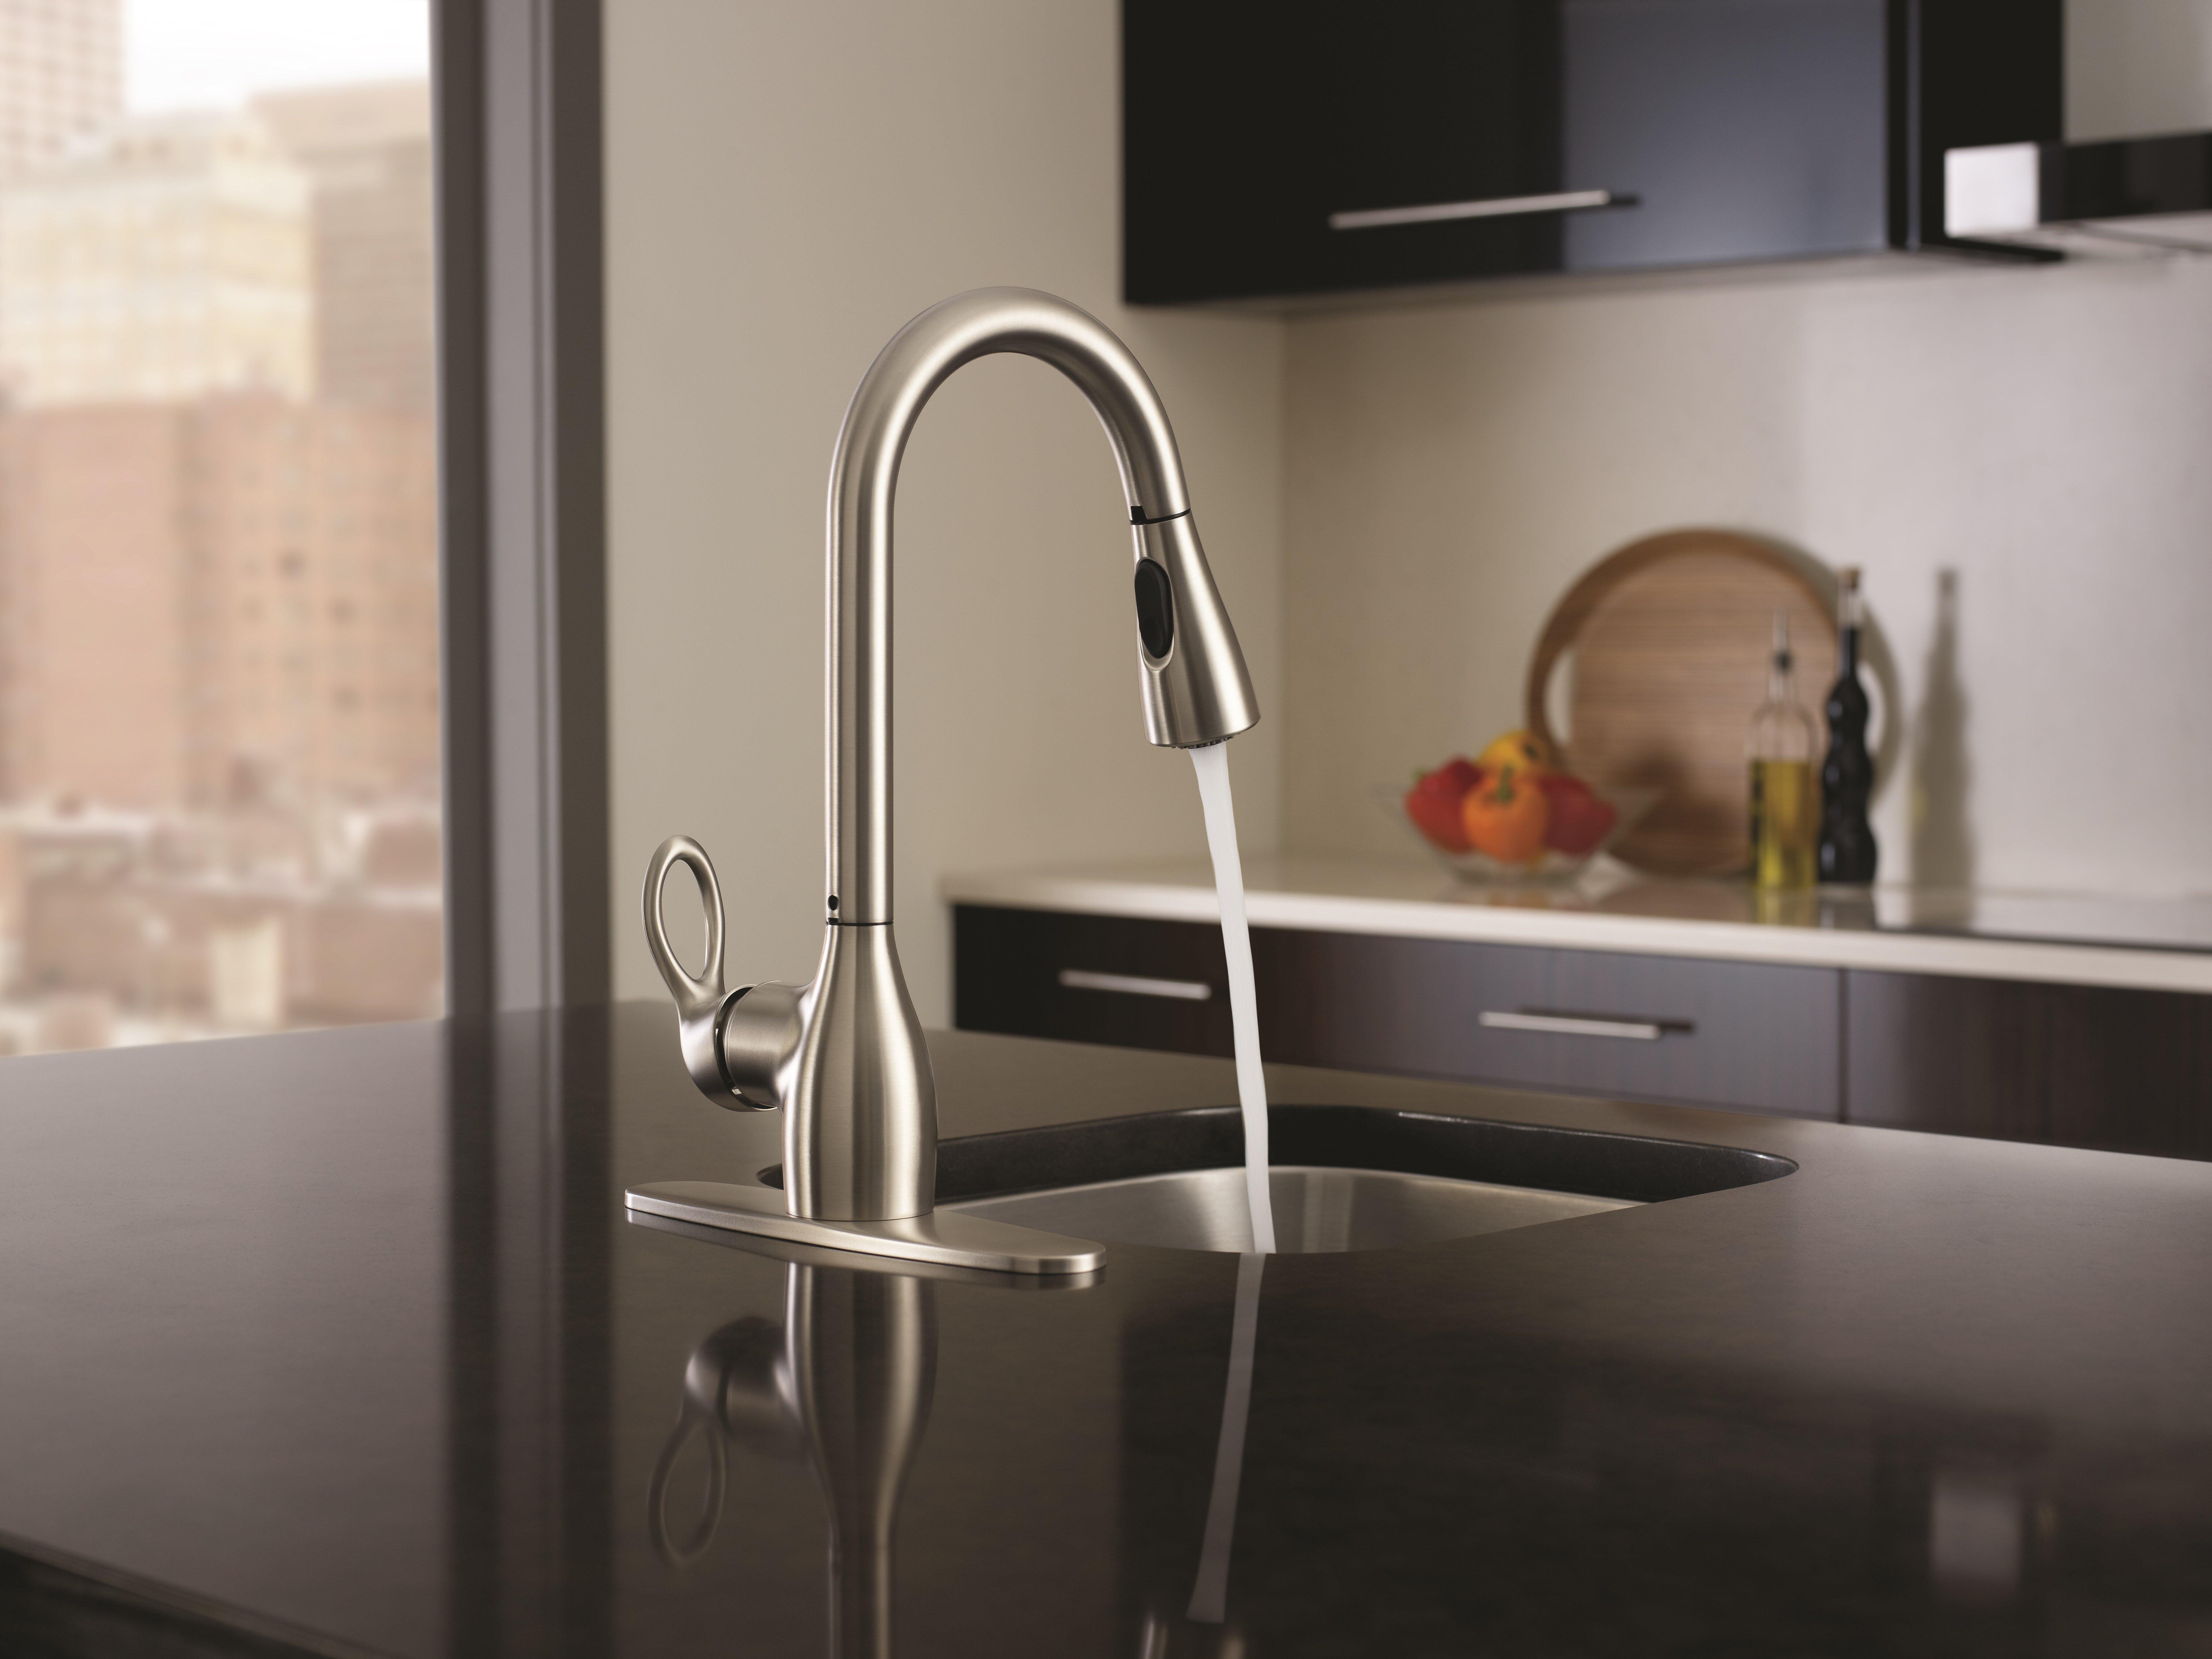 Moen Kleo Single Handle Kitchen Faucet With Duralock And Reflex Reviews Wayfair